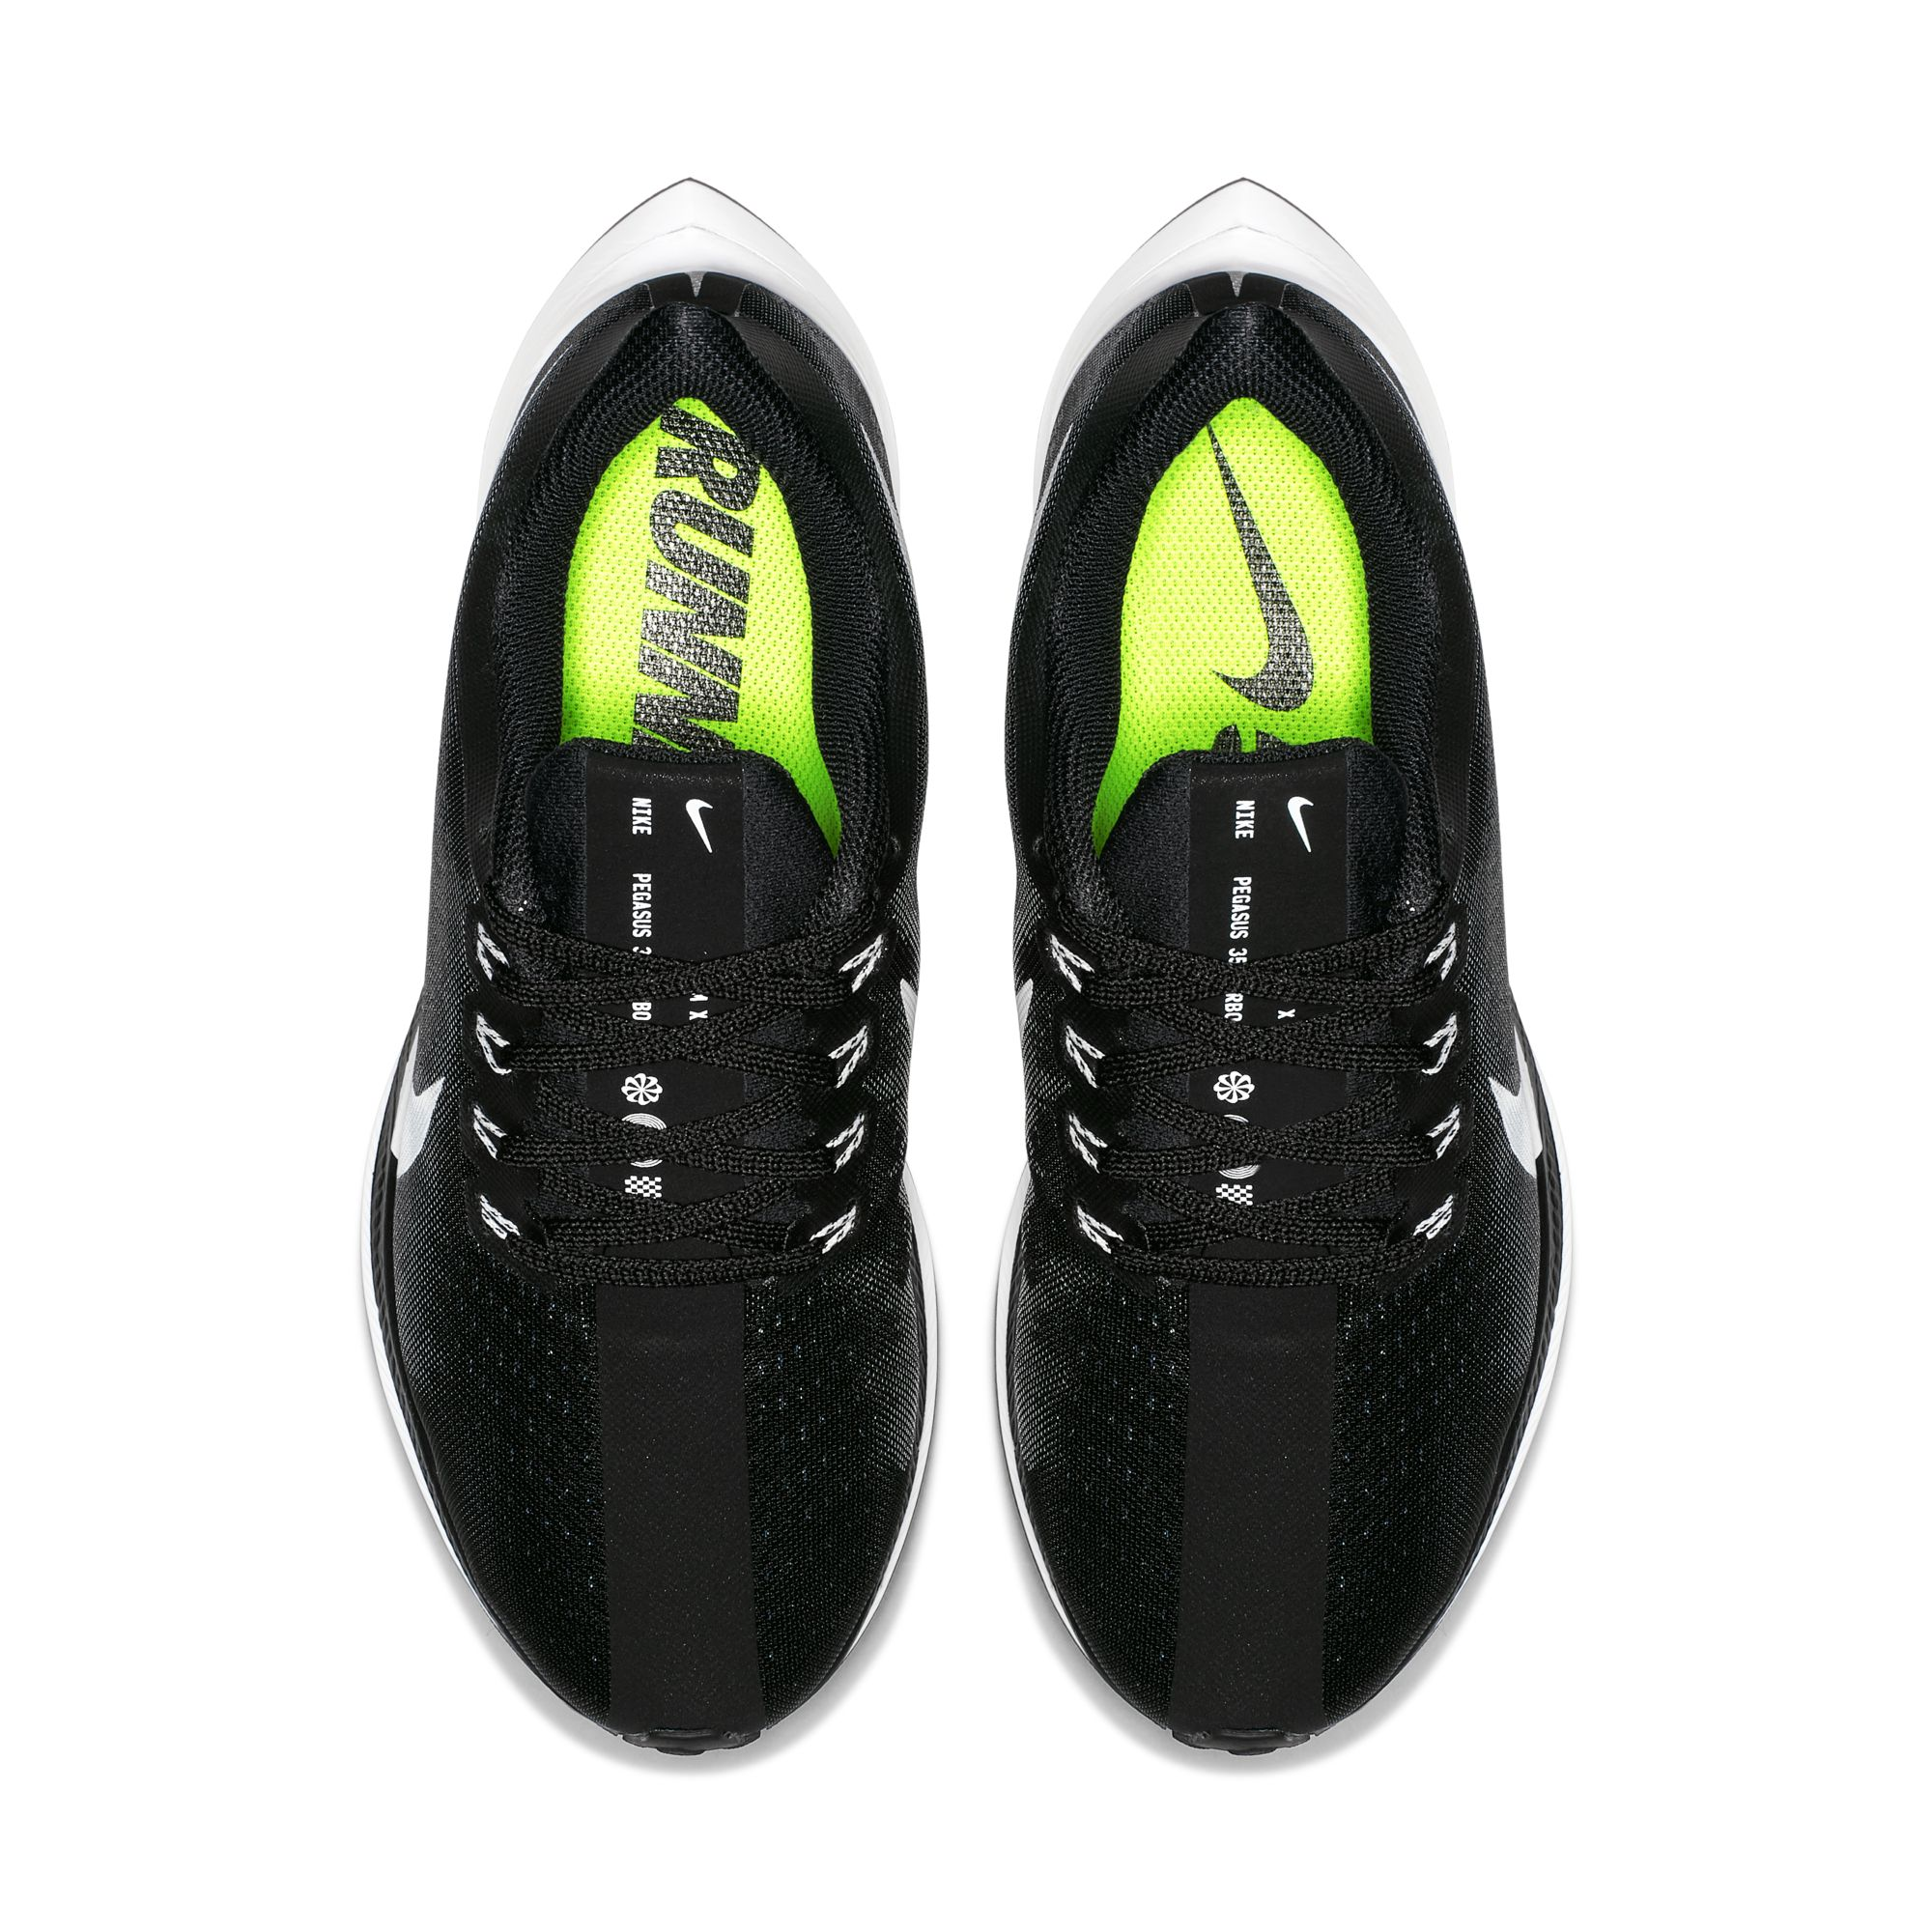 new arrival 763c9 90578 The Nike Zoom Pegasus Turbo 'Black/White' Drops Next Week ...